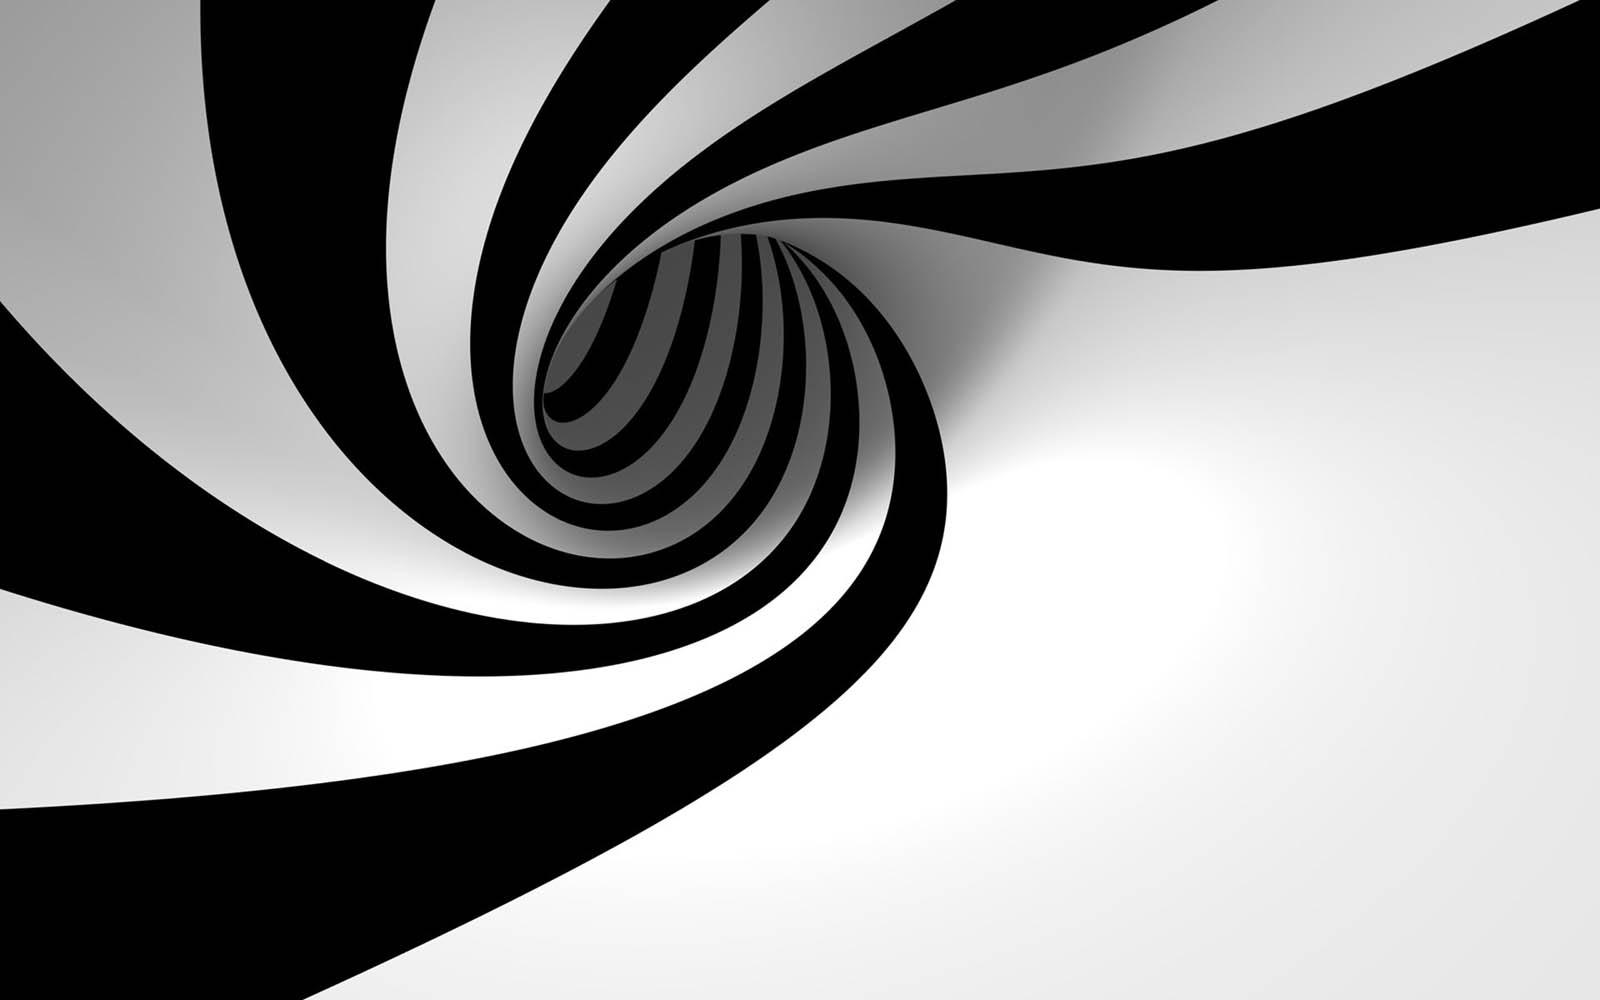 wallpaper 3d graphic spiral wallpapers